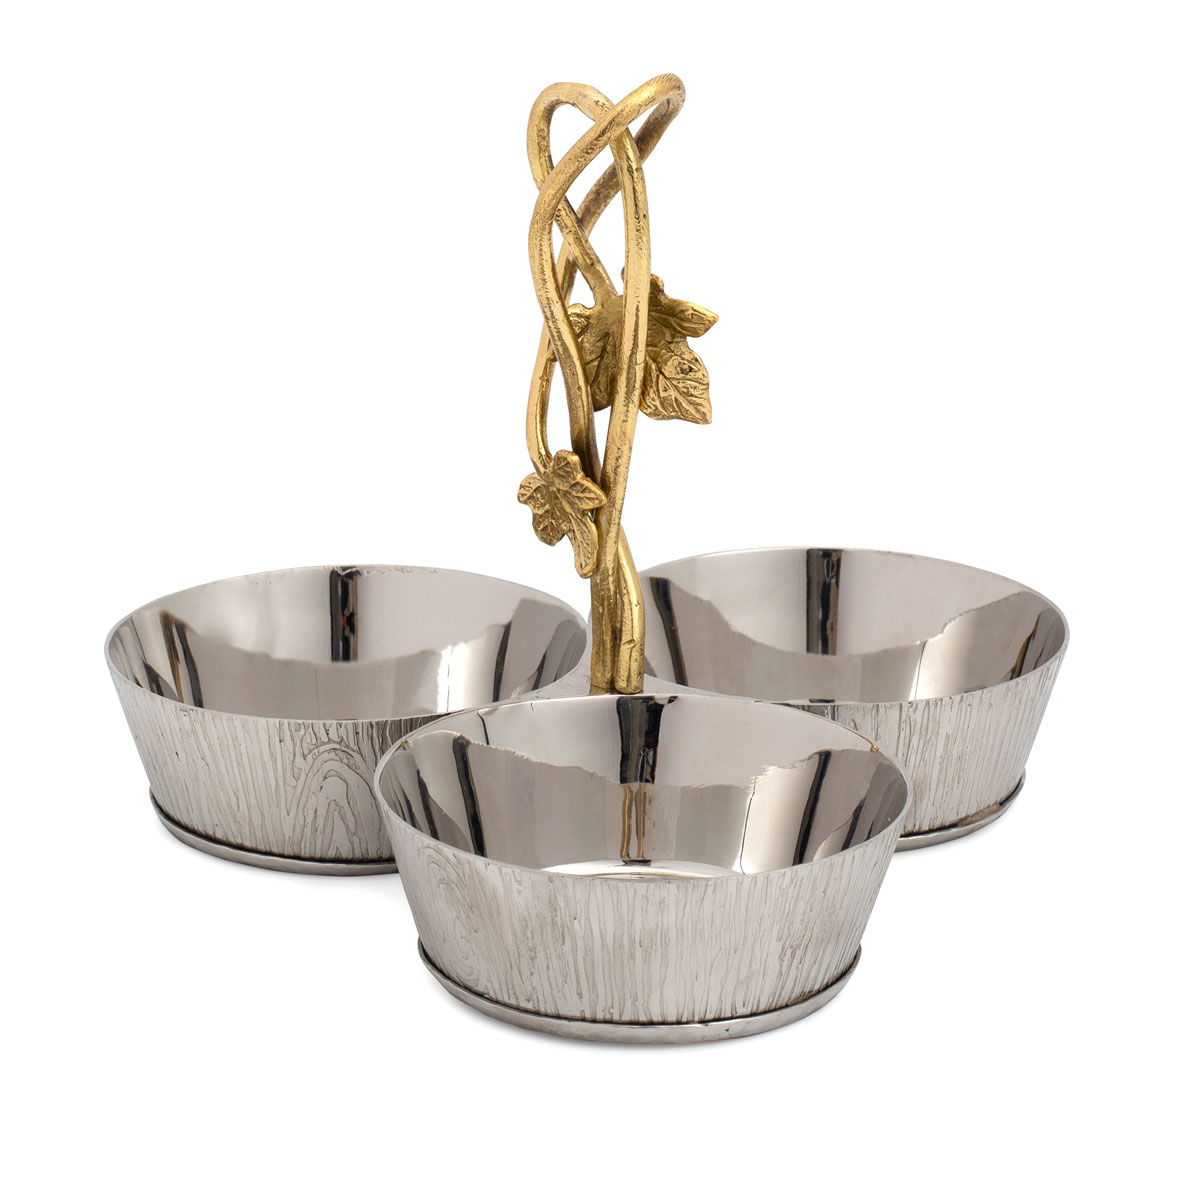 Michael Aram Ivy and Oak Triple Dish Set